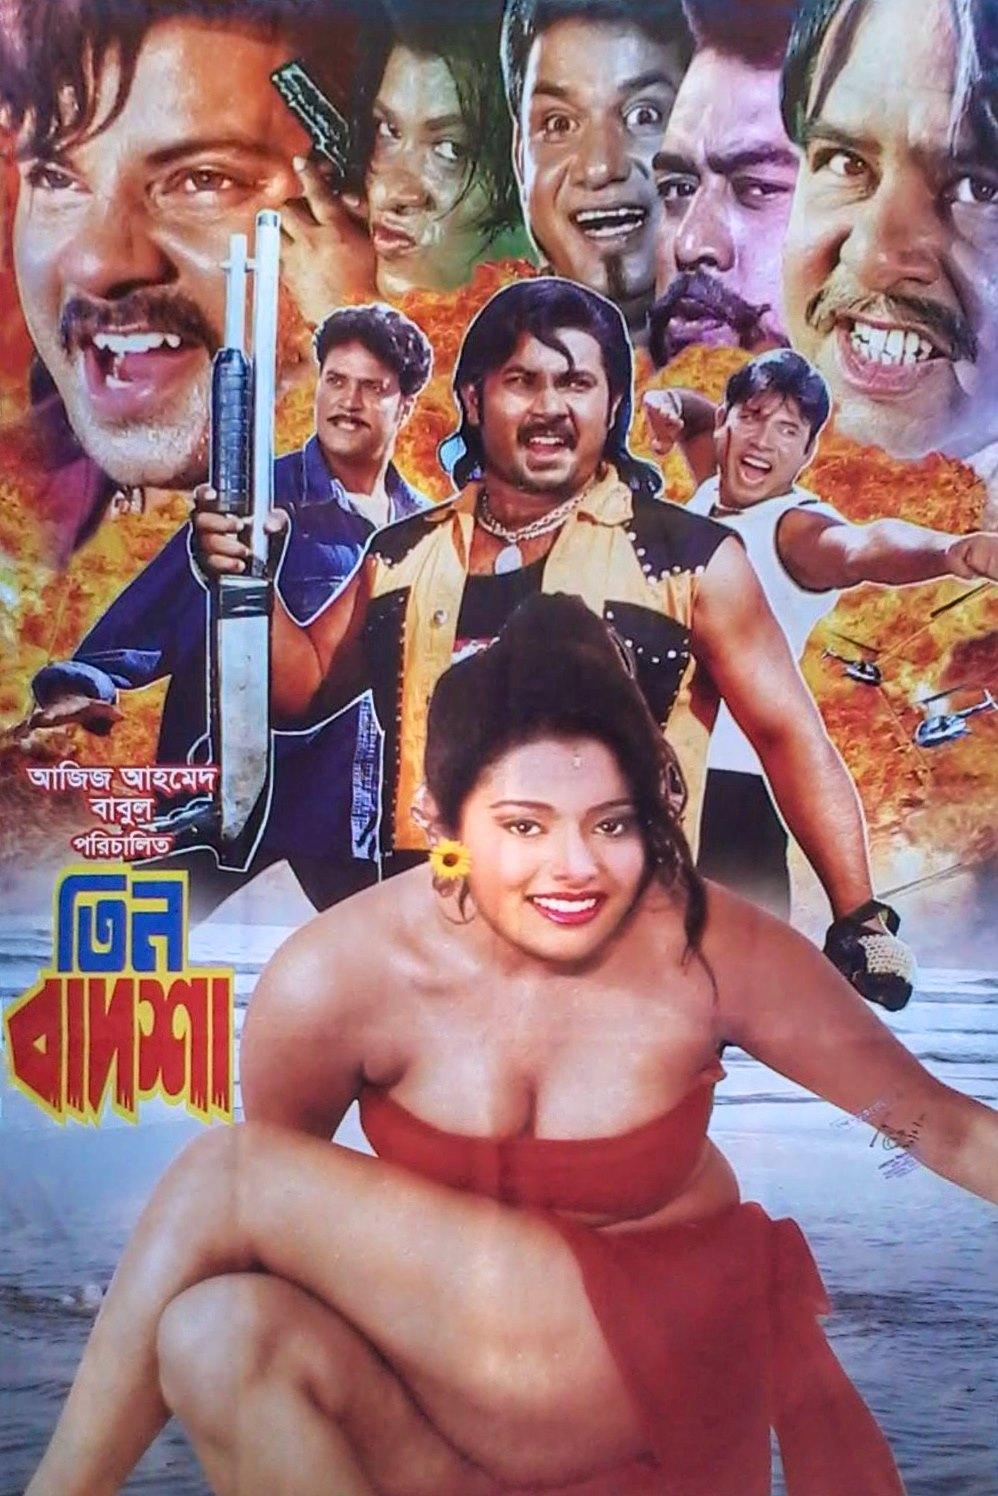 18+ Tin Badsha 2021 Bangla Hot Movie 720p HDRip Download